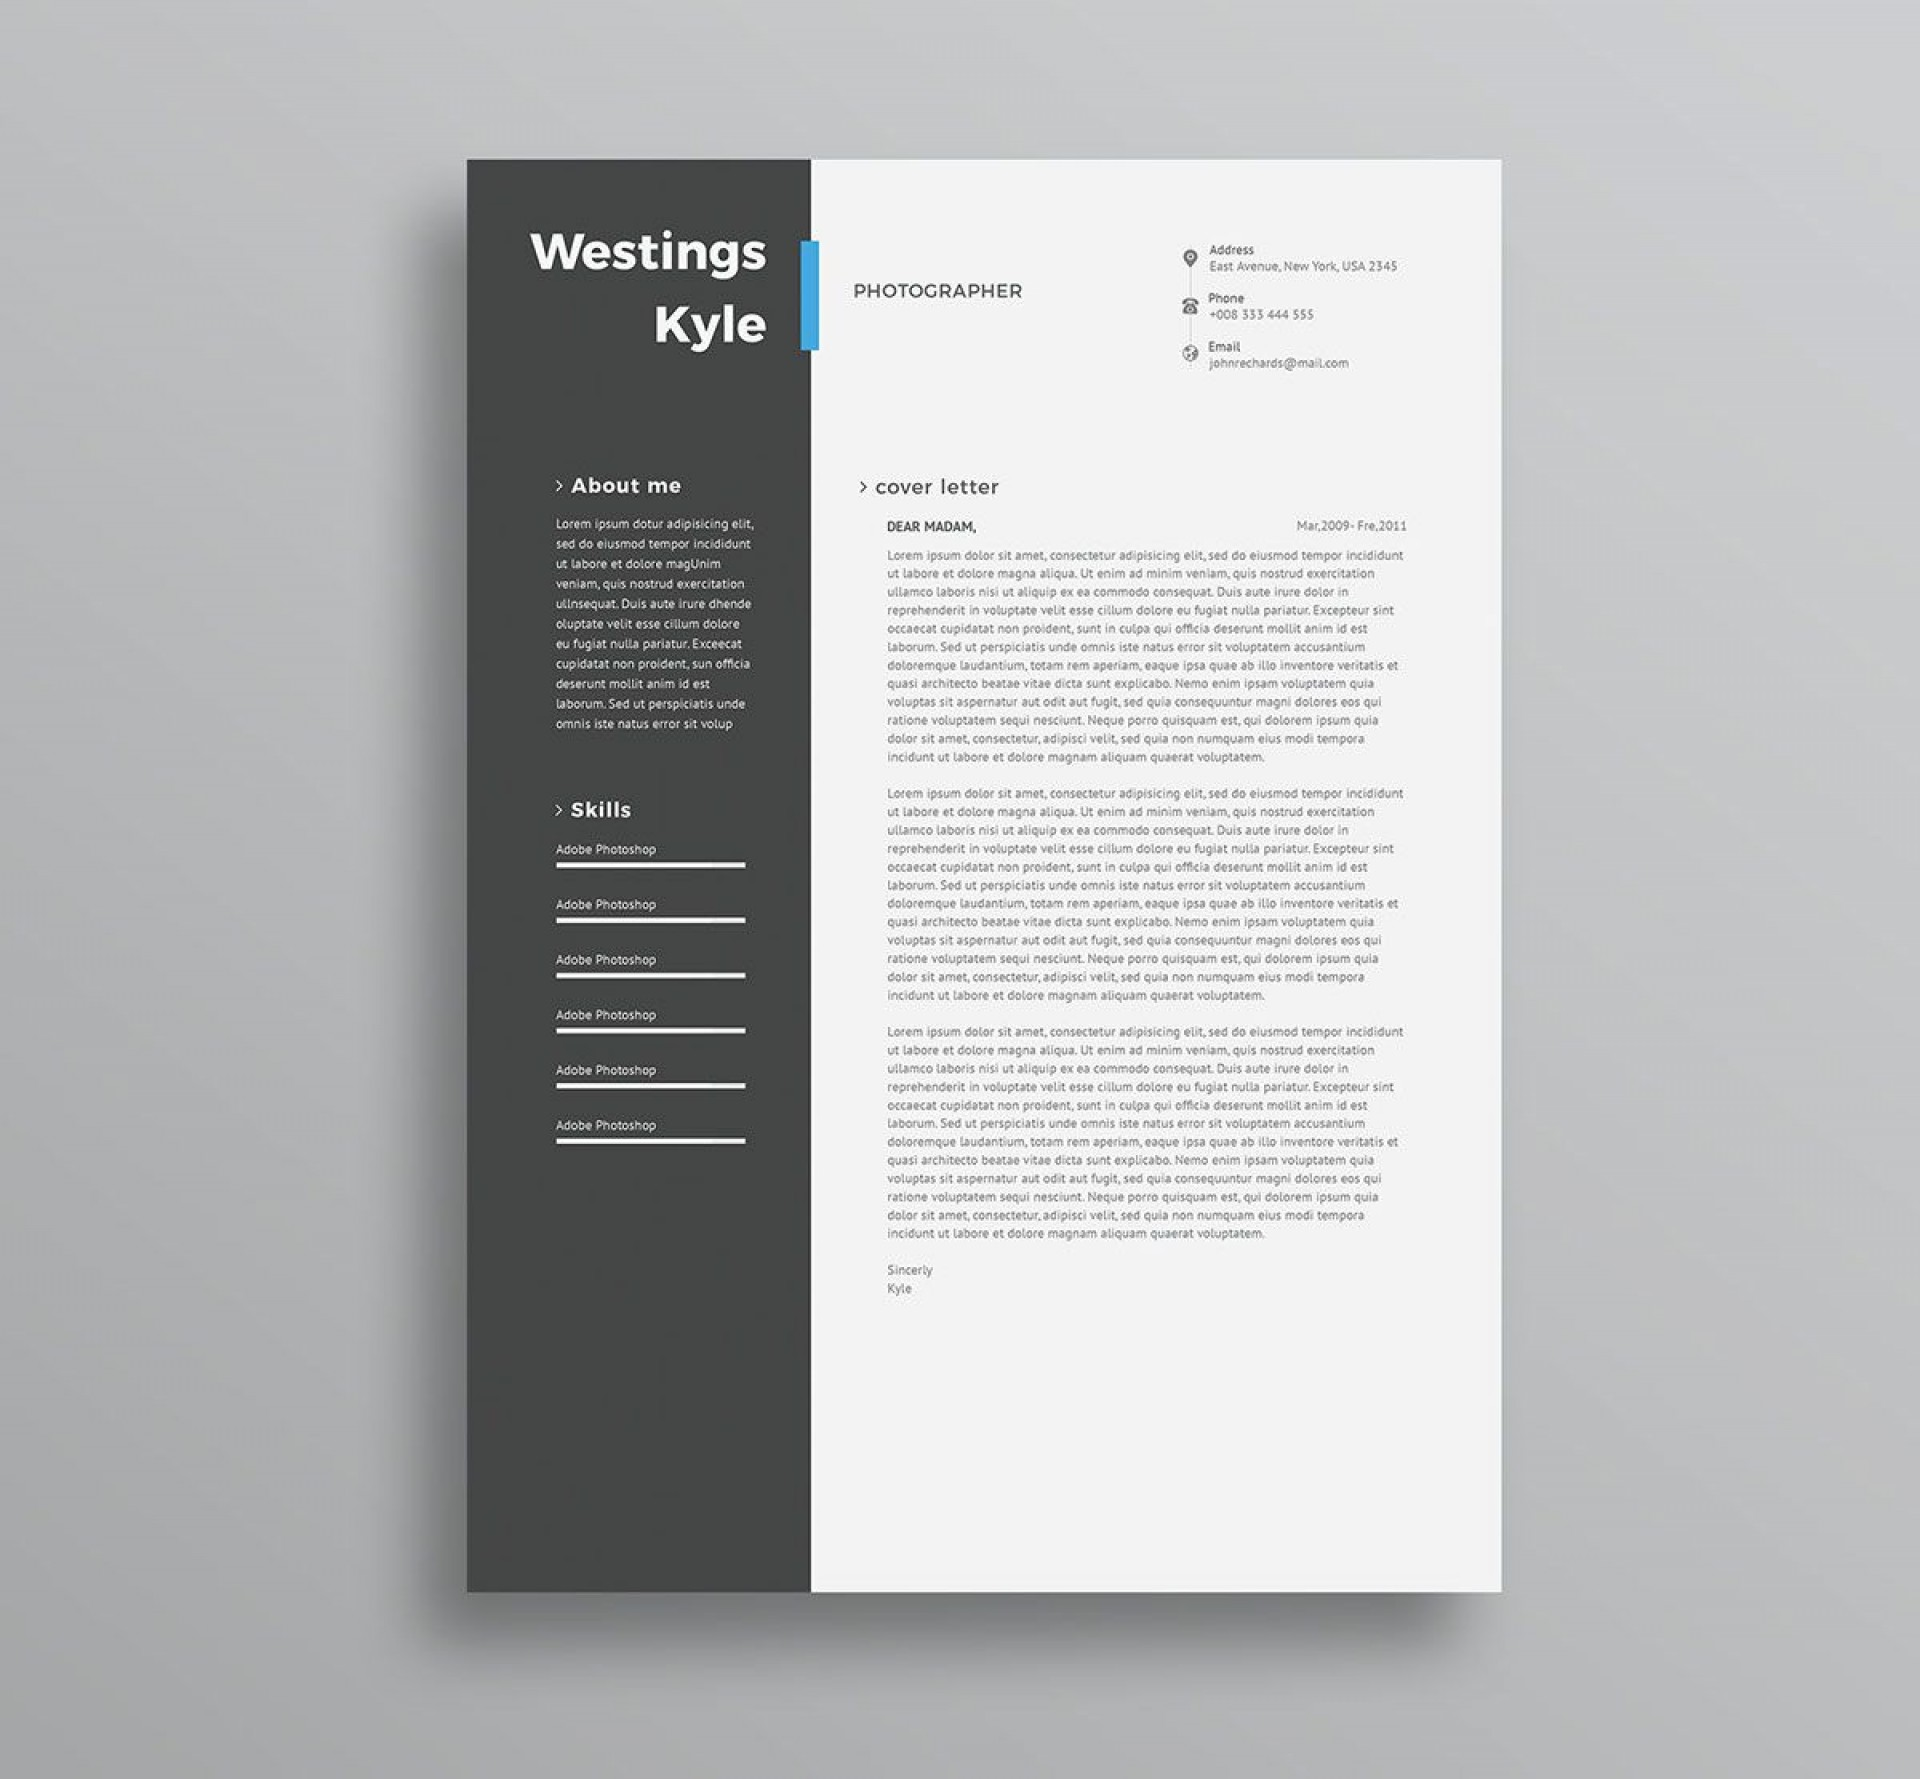 003 Best Resume Template Word Free Download 2018 Highest Quality  Modern Cv1920